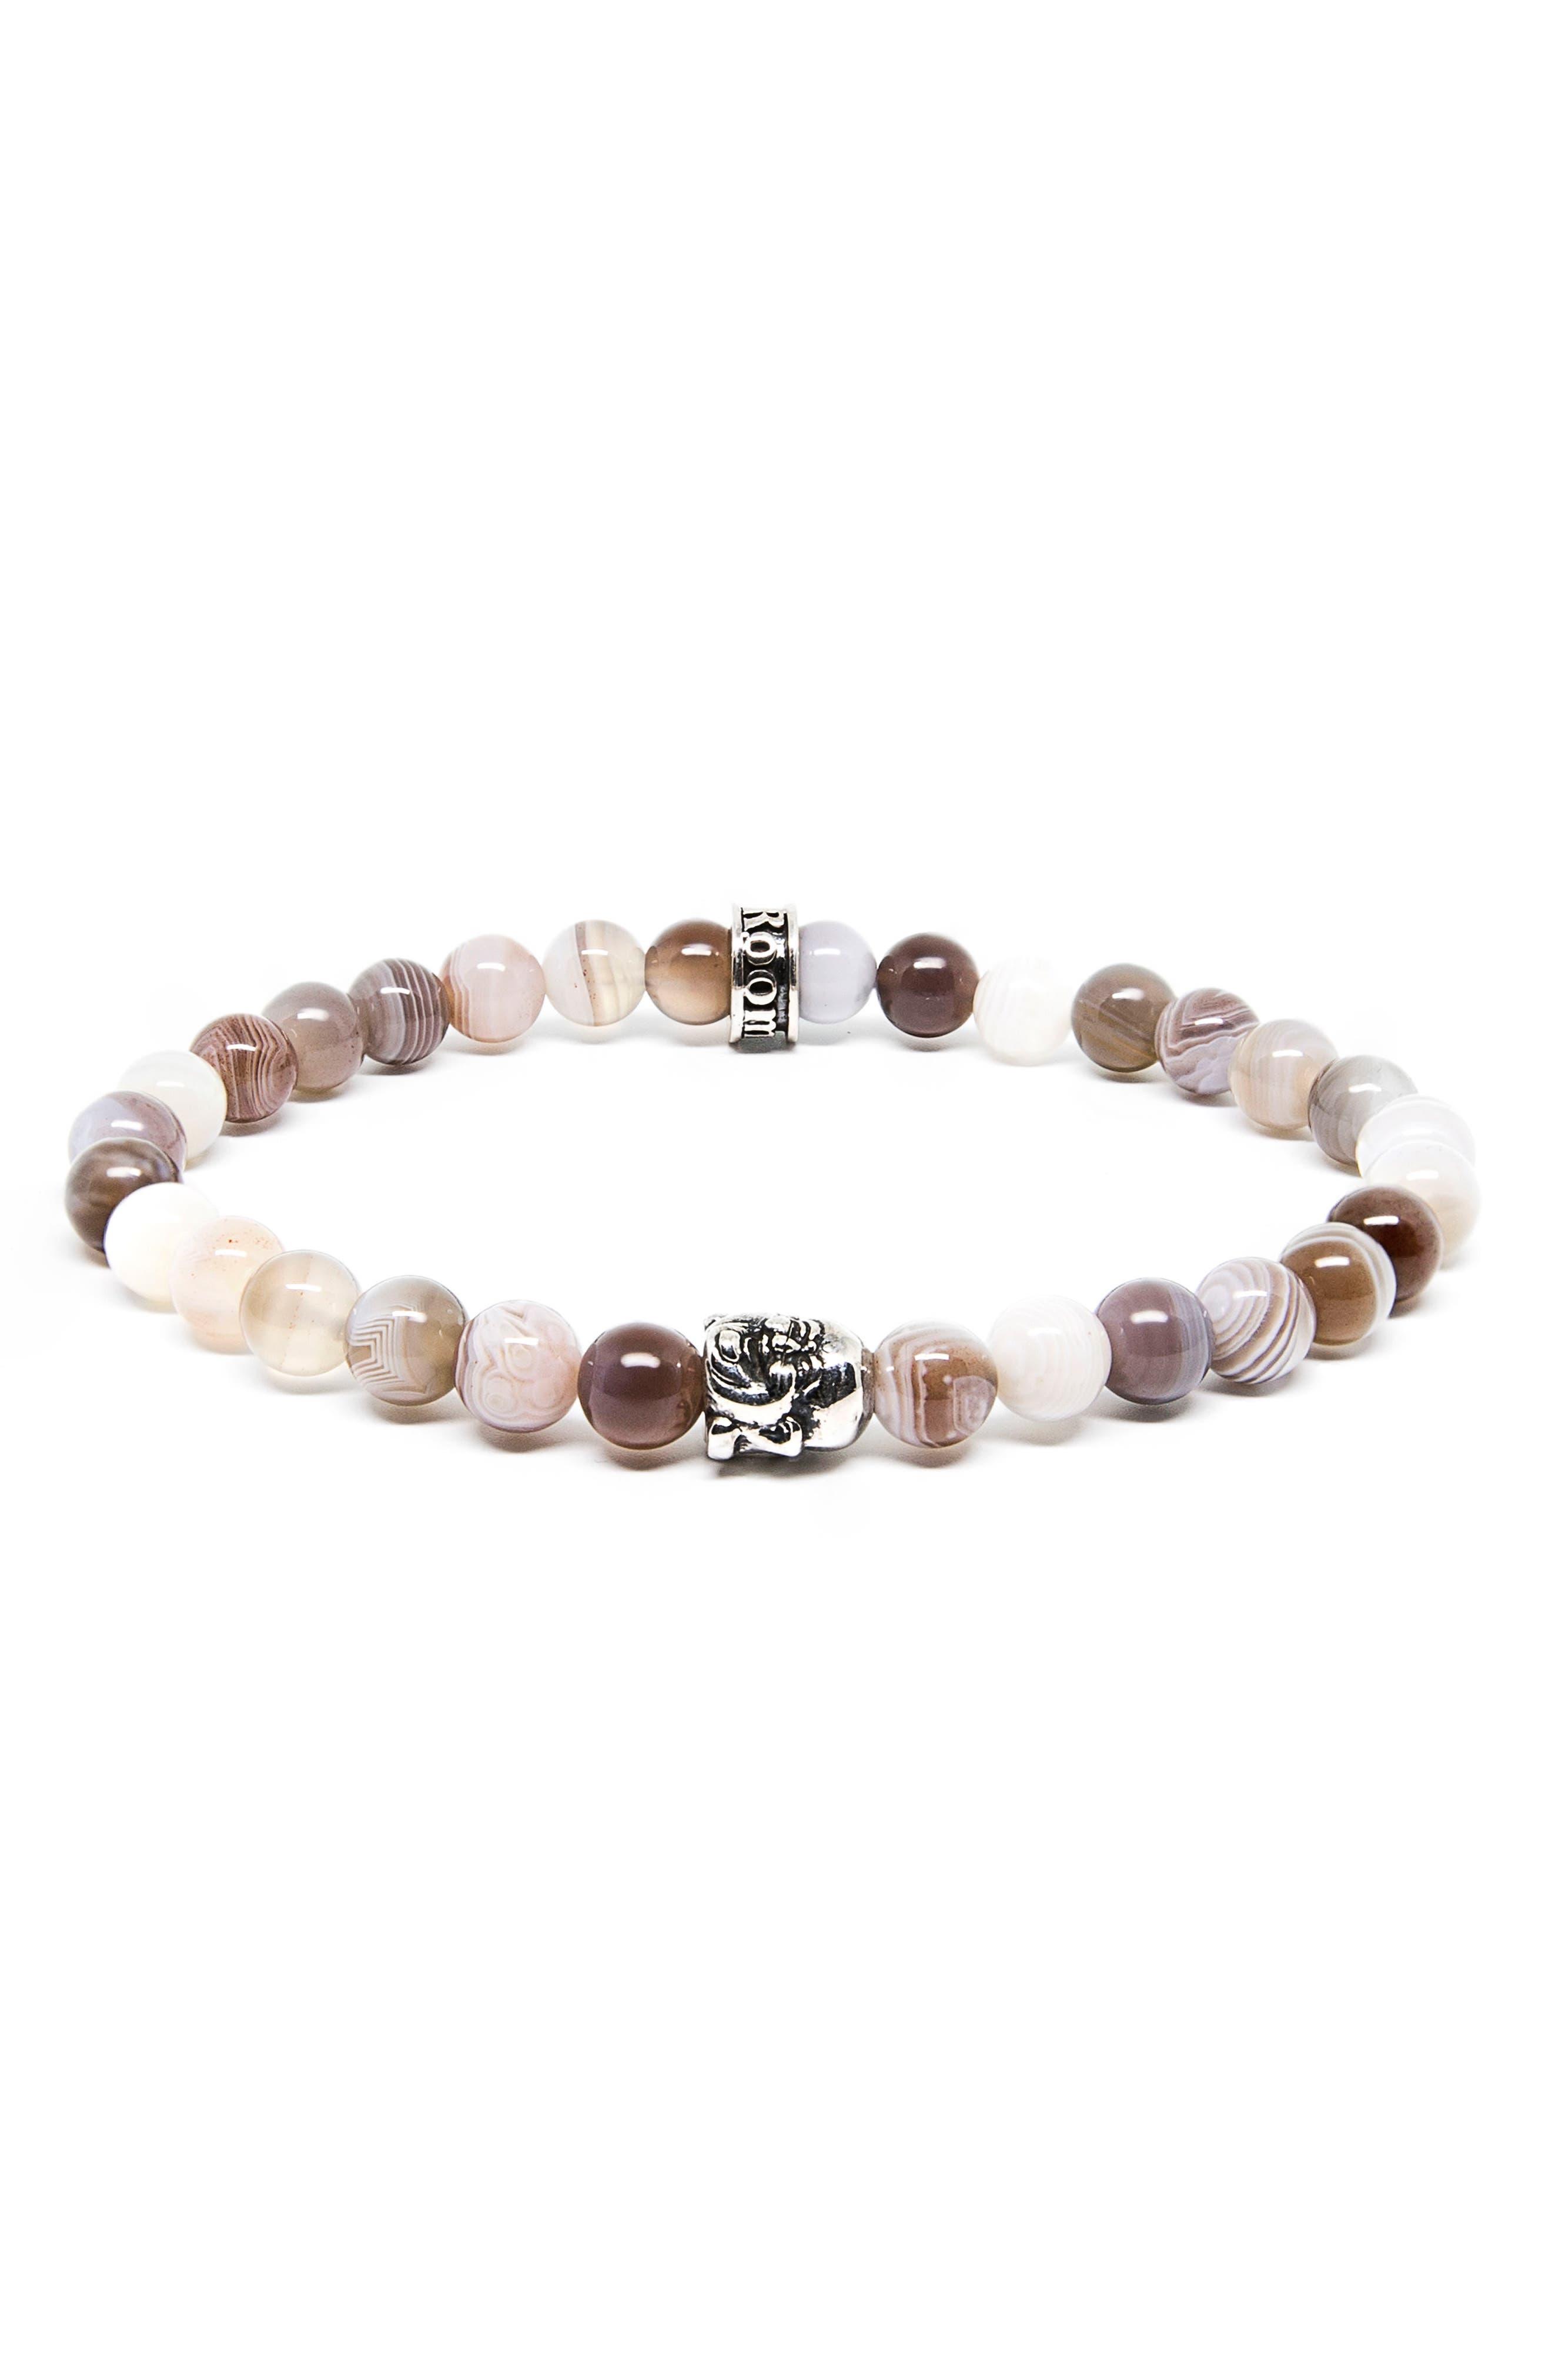 Main Image - Room101 Agate Buddha Stretch Bracelet